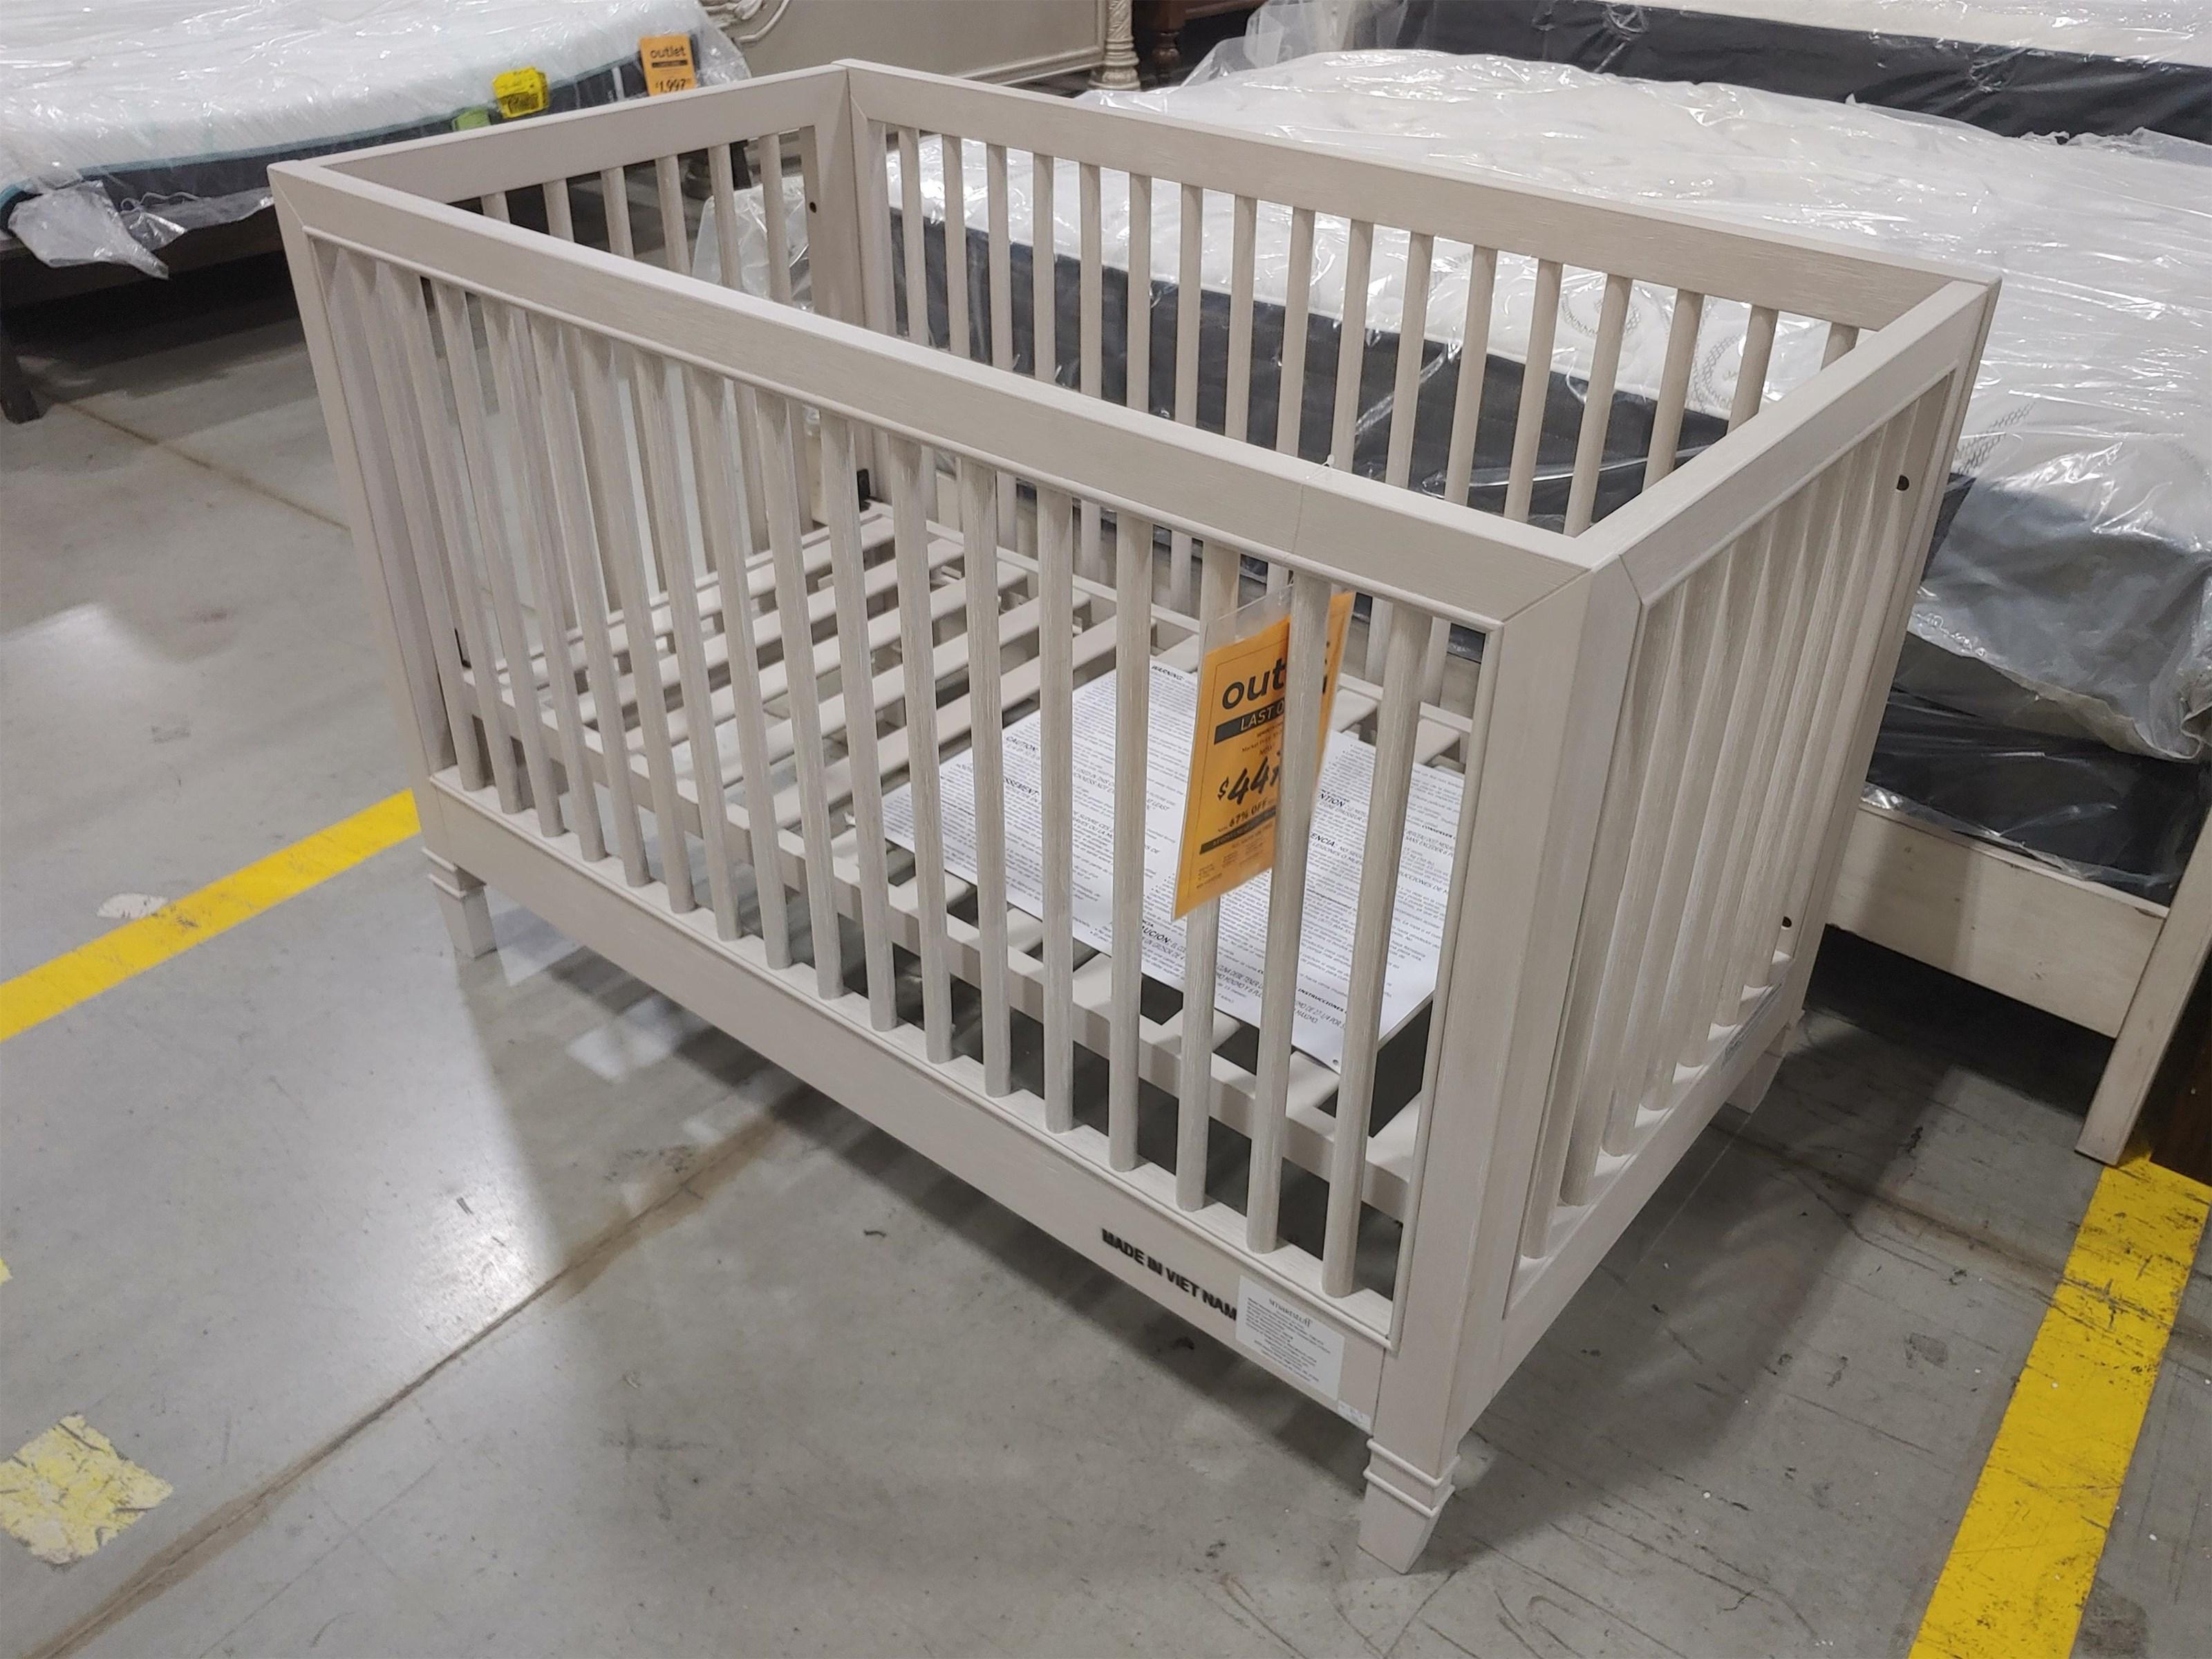 Last One Crib Last One! Crib by Universal at Morris Home